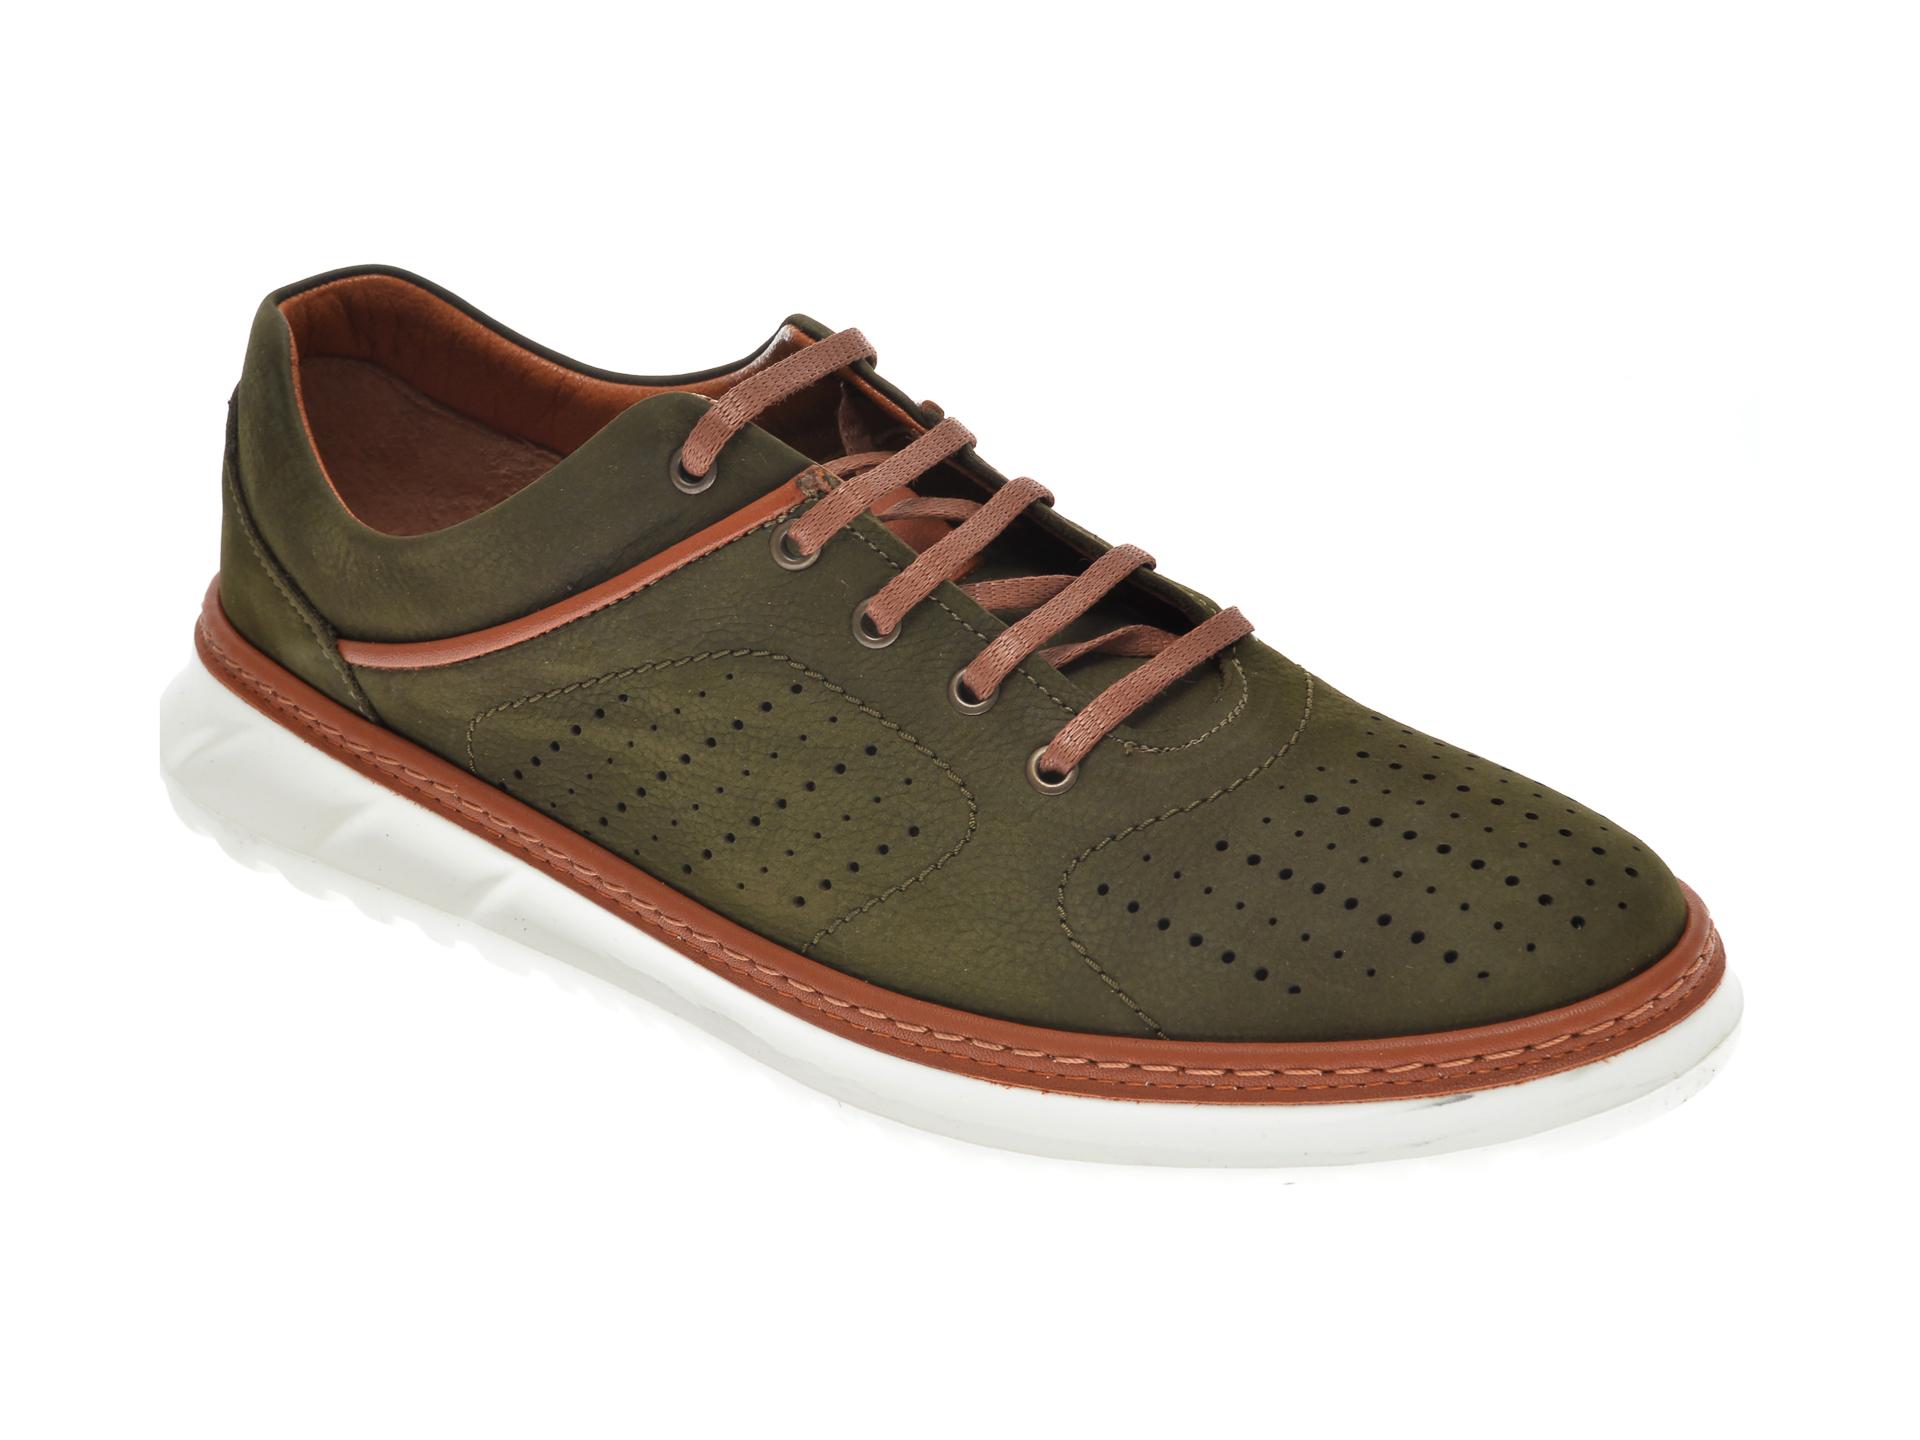 Pantofi OTTER verzi, 1830, din nabuc